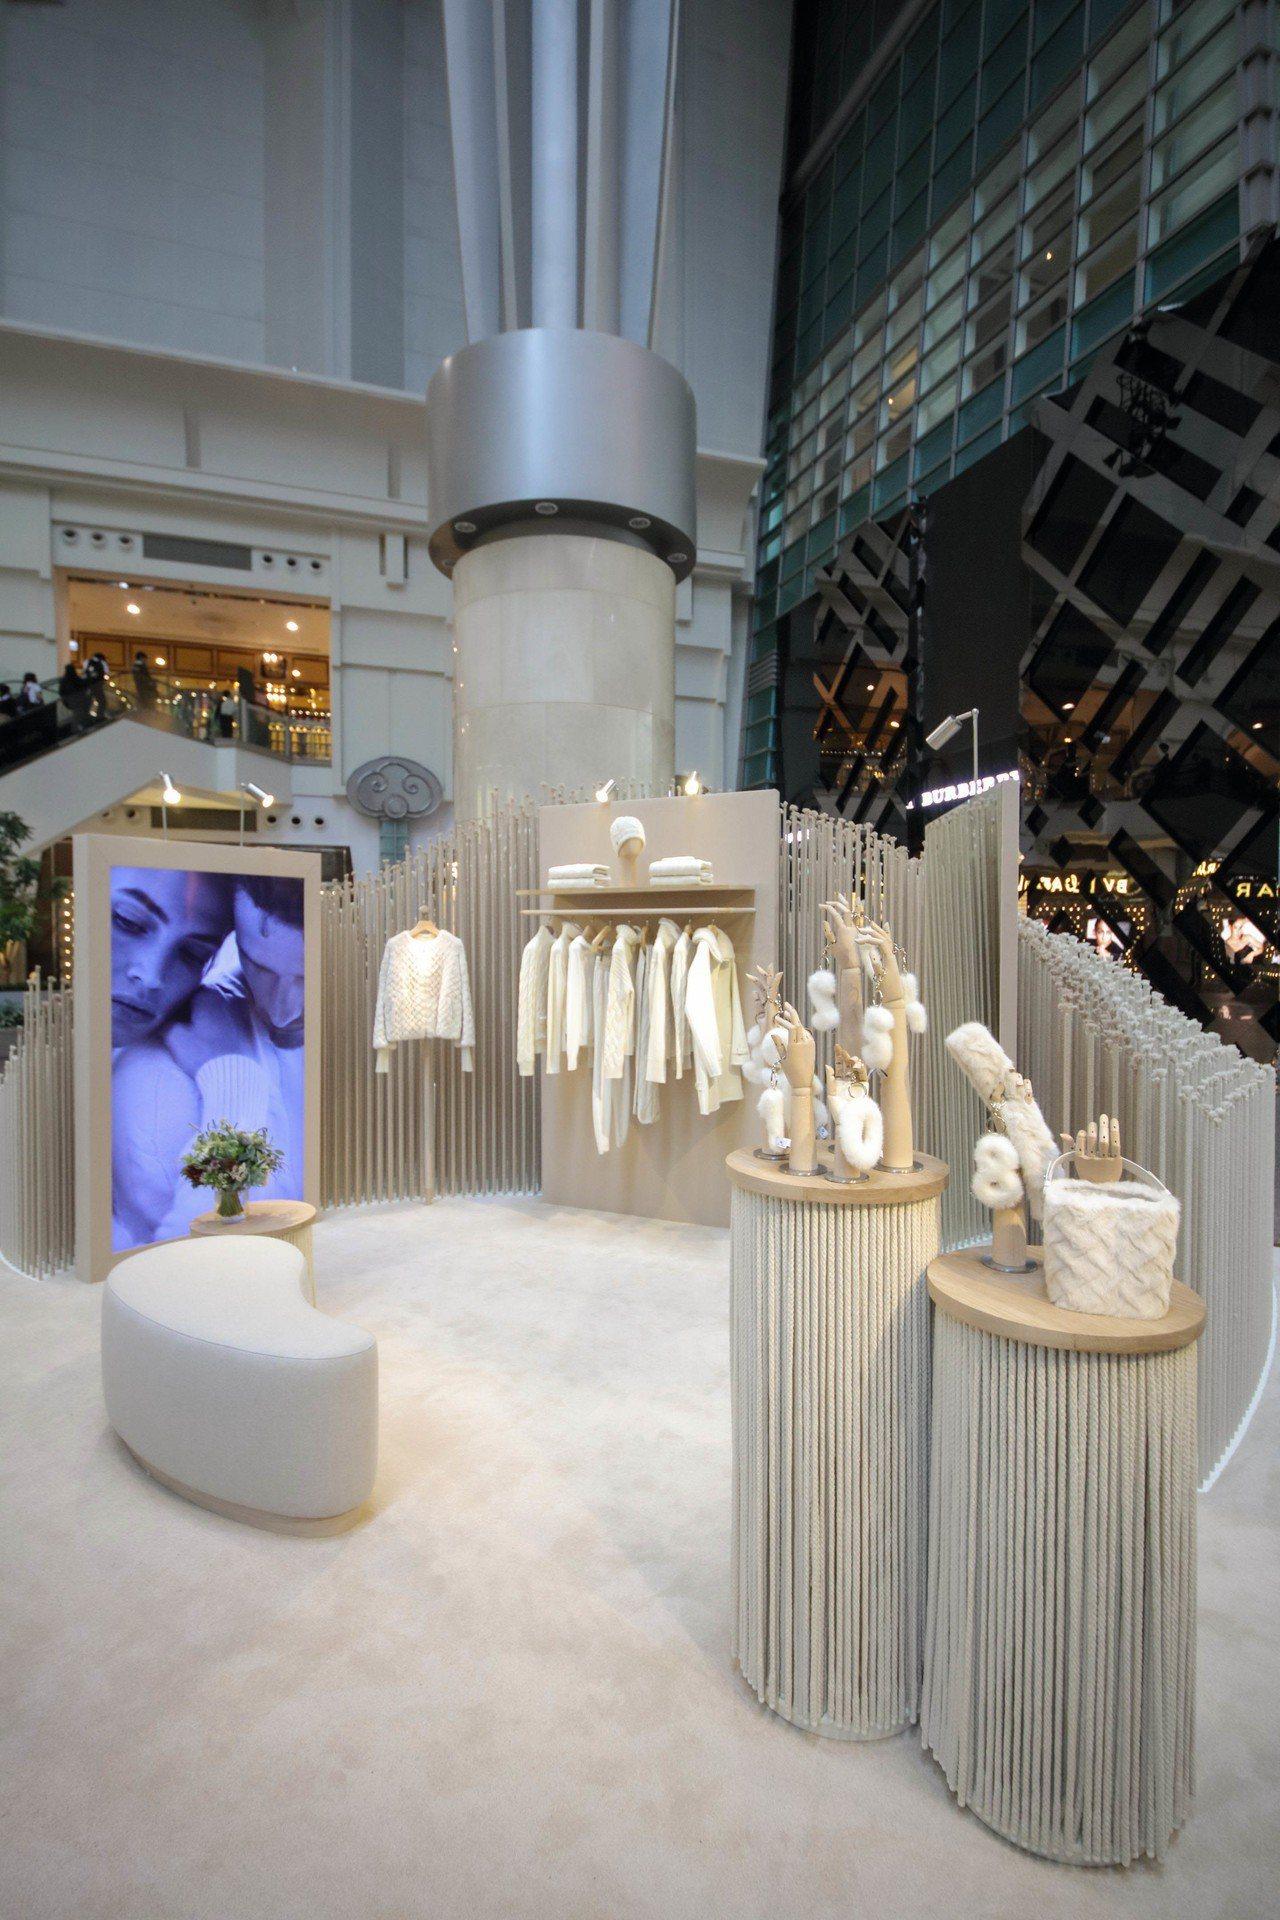 Loro Piana「純淨之丘.臻然極境」10周年誌慶概念展於101的4樓展出,...